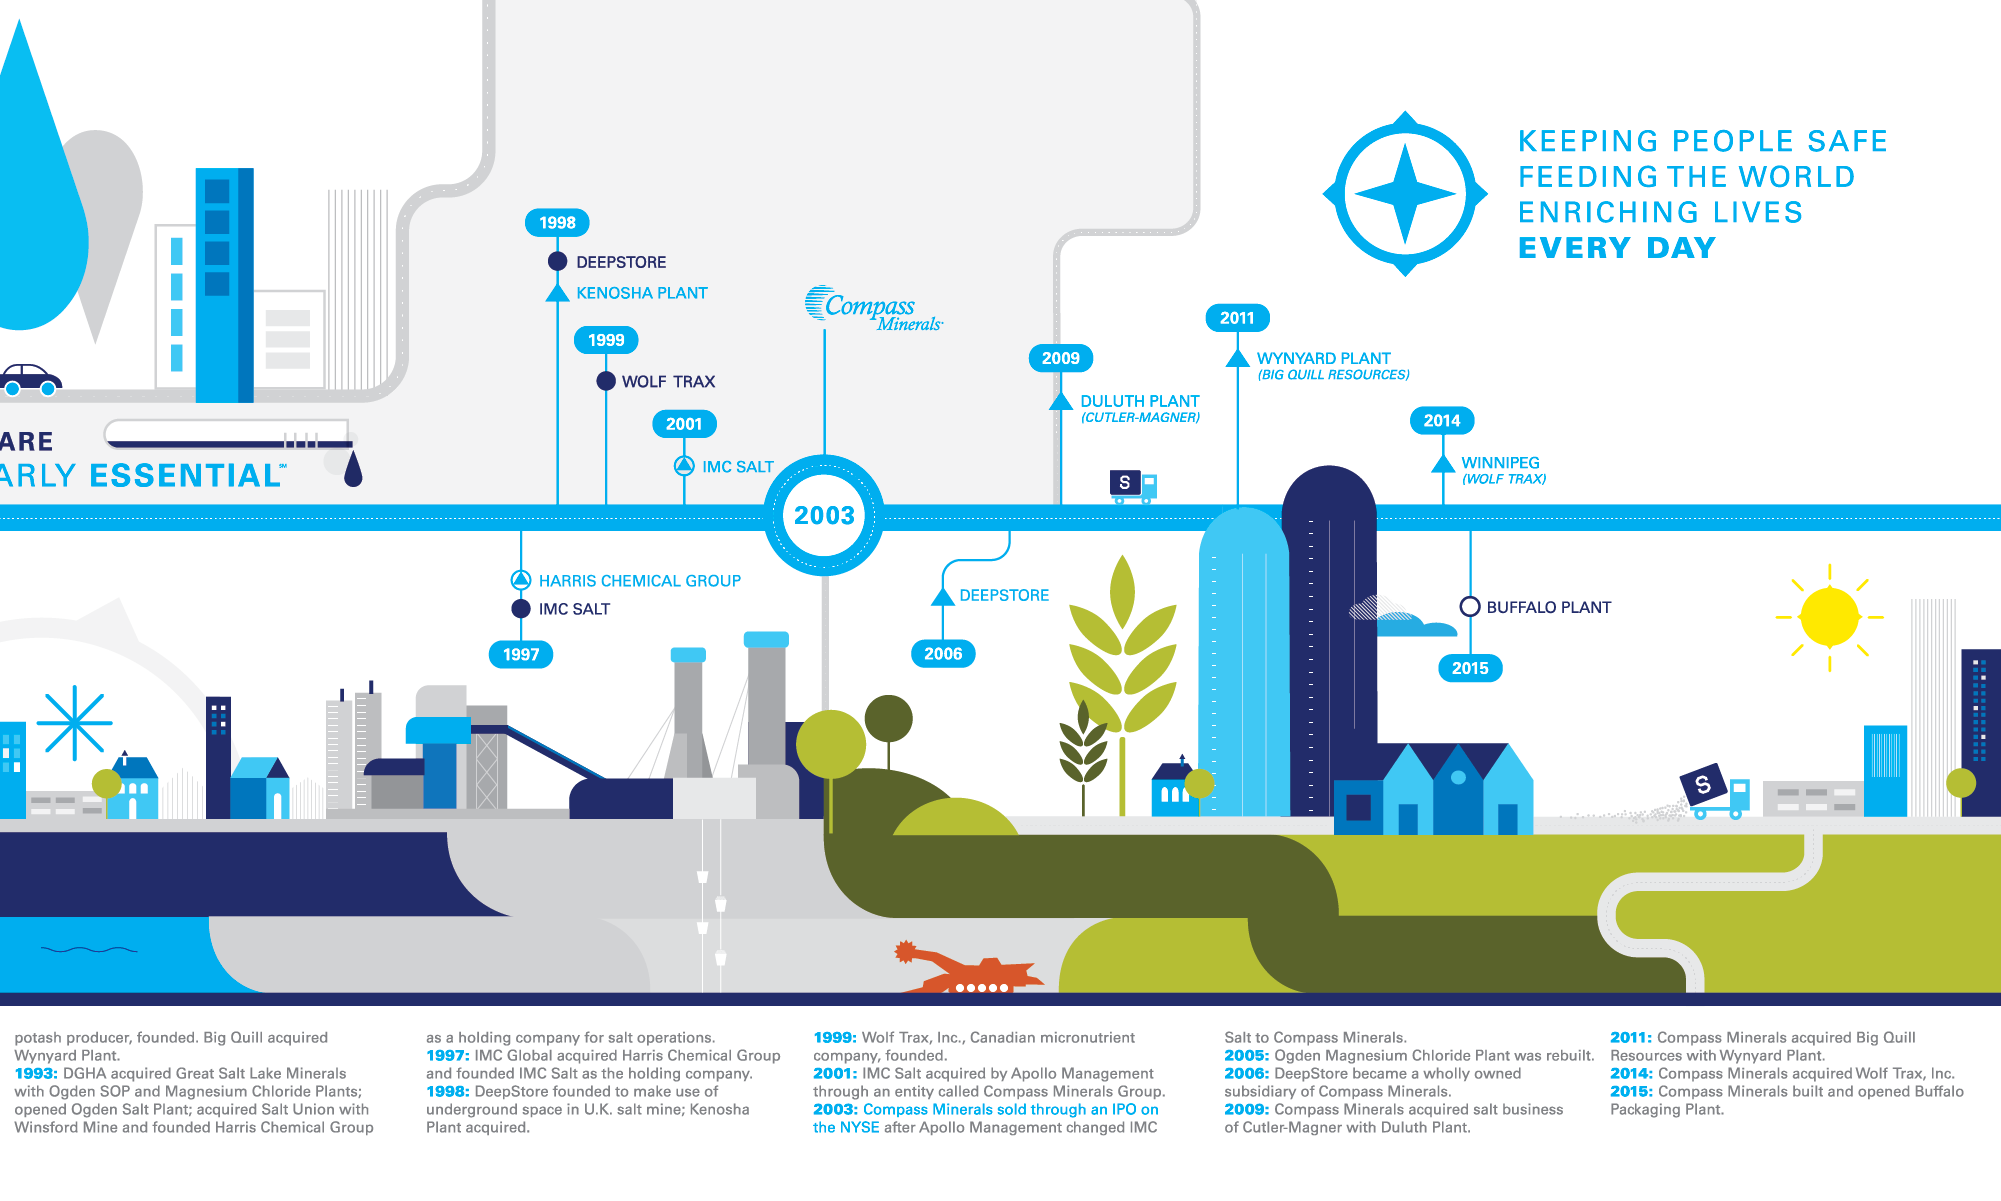 Compass Minerals Timeline